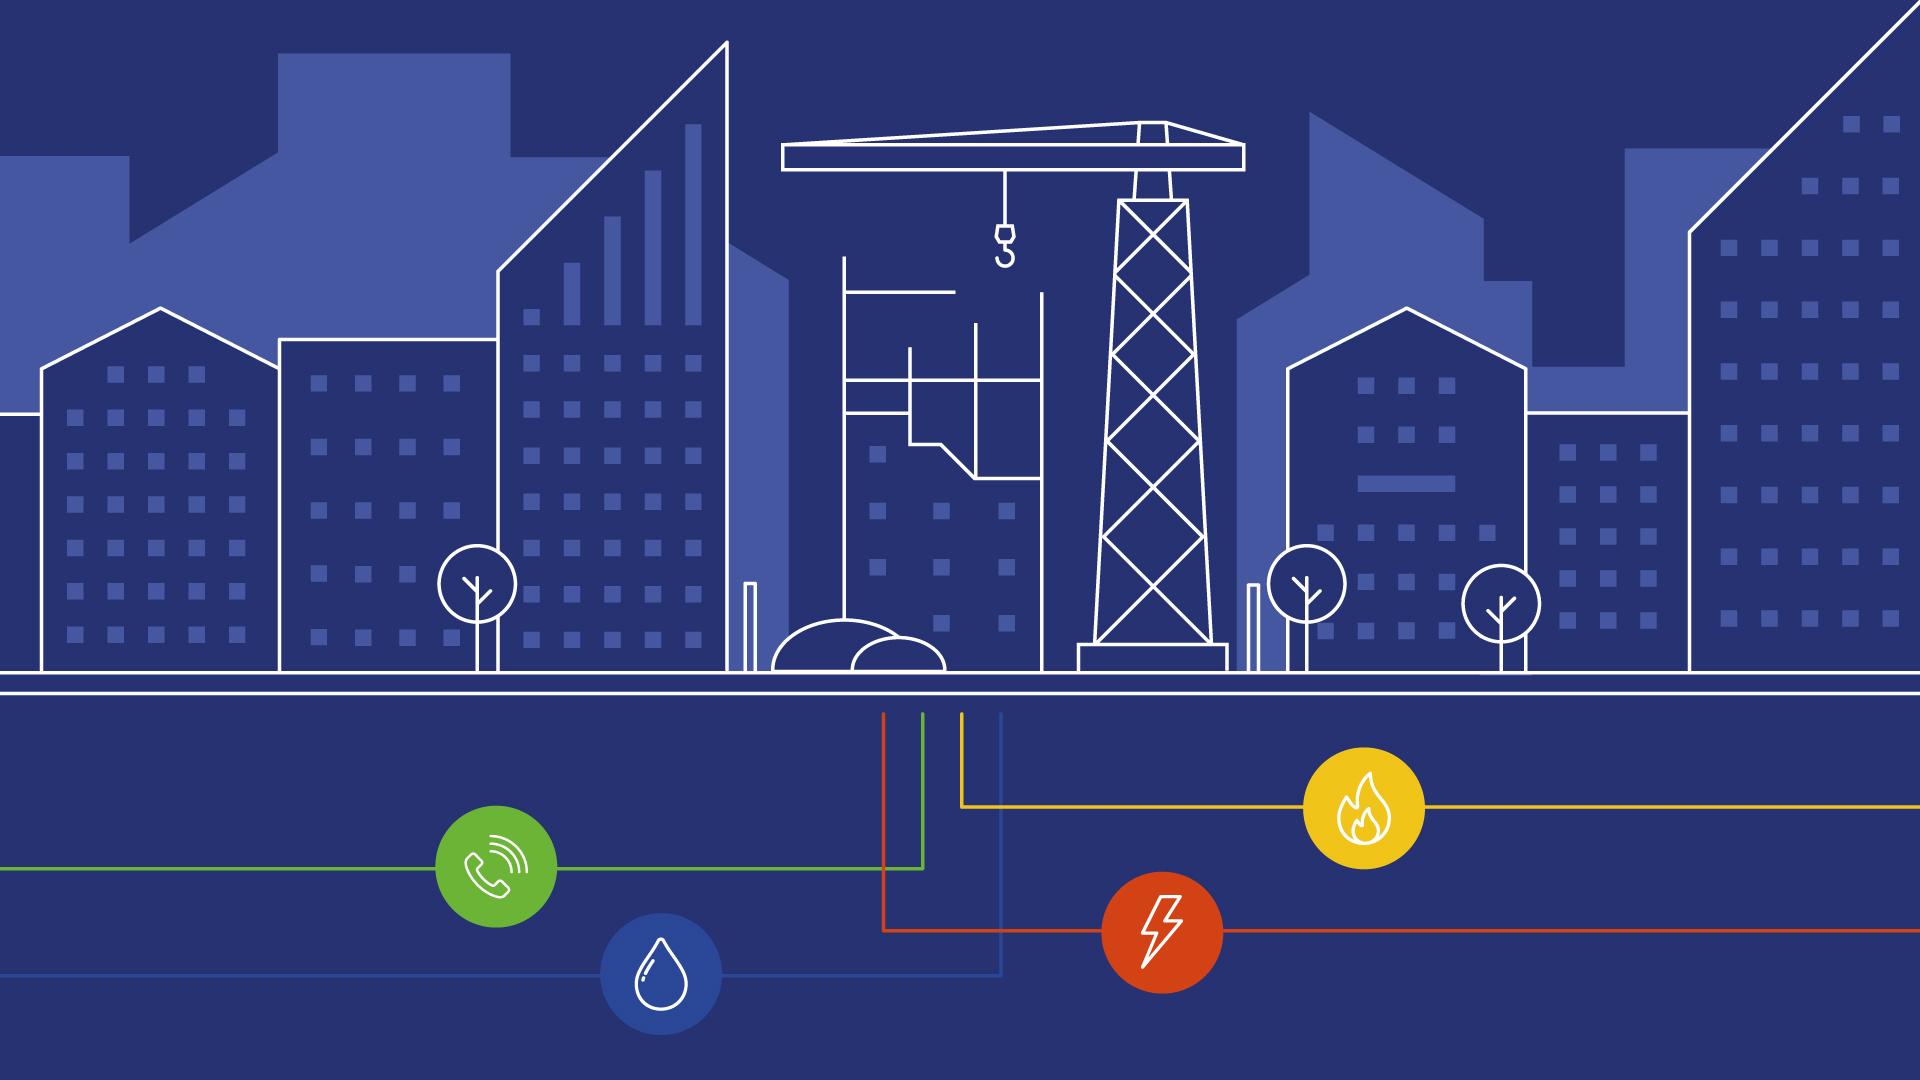 Construction UK - Utilities - Telecoms, Water, Electric, Gas